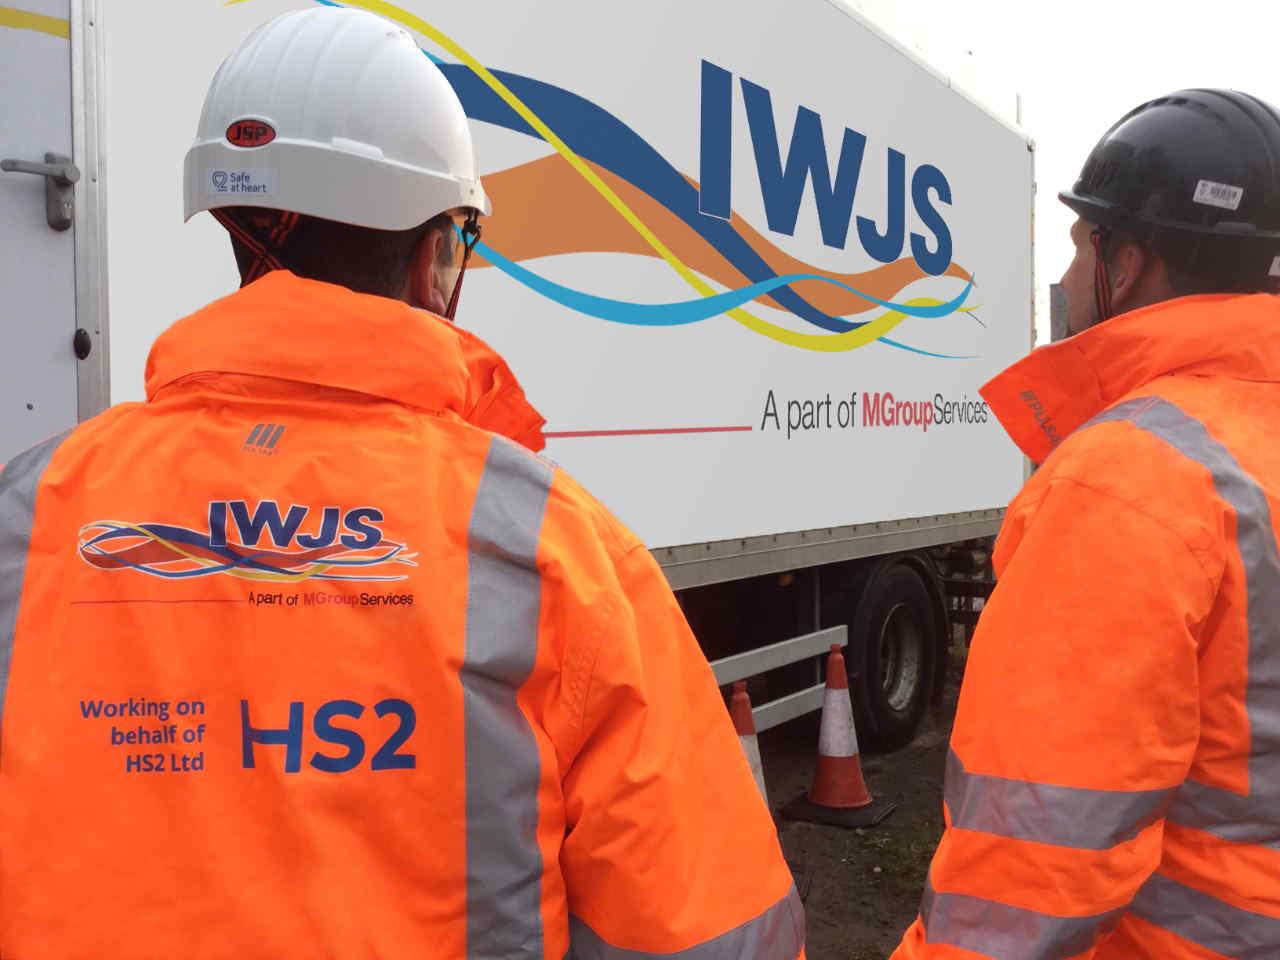 IWJS working on behalf of HS2